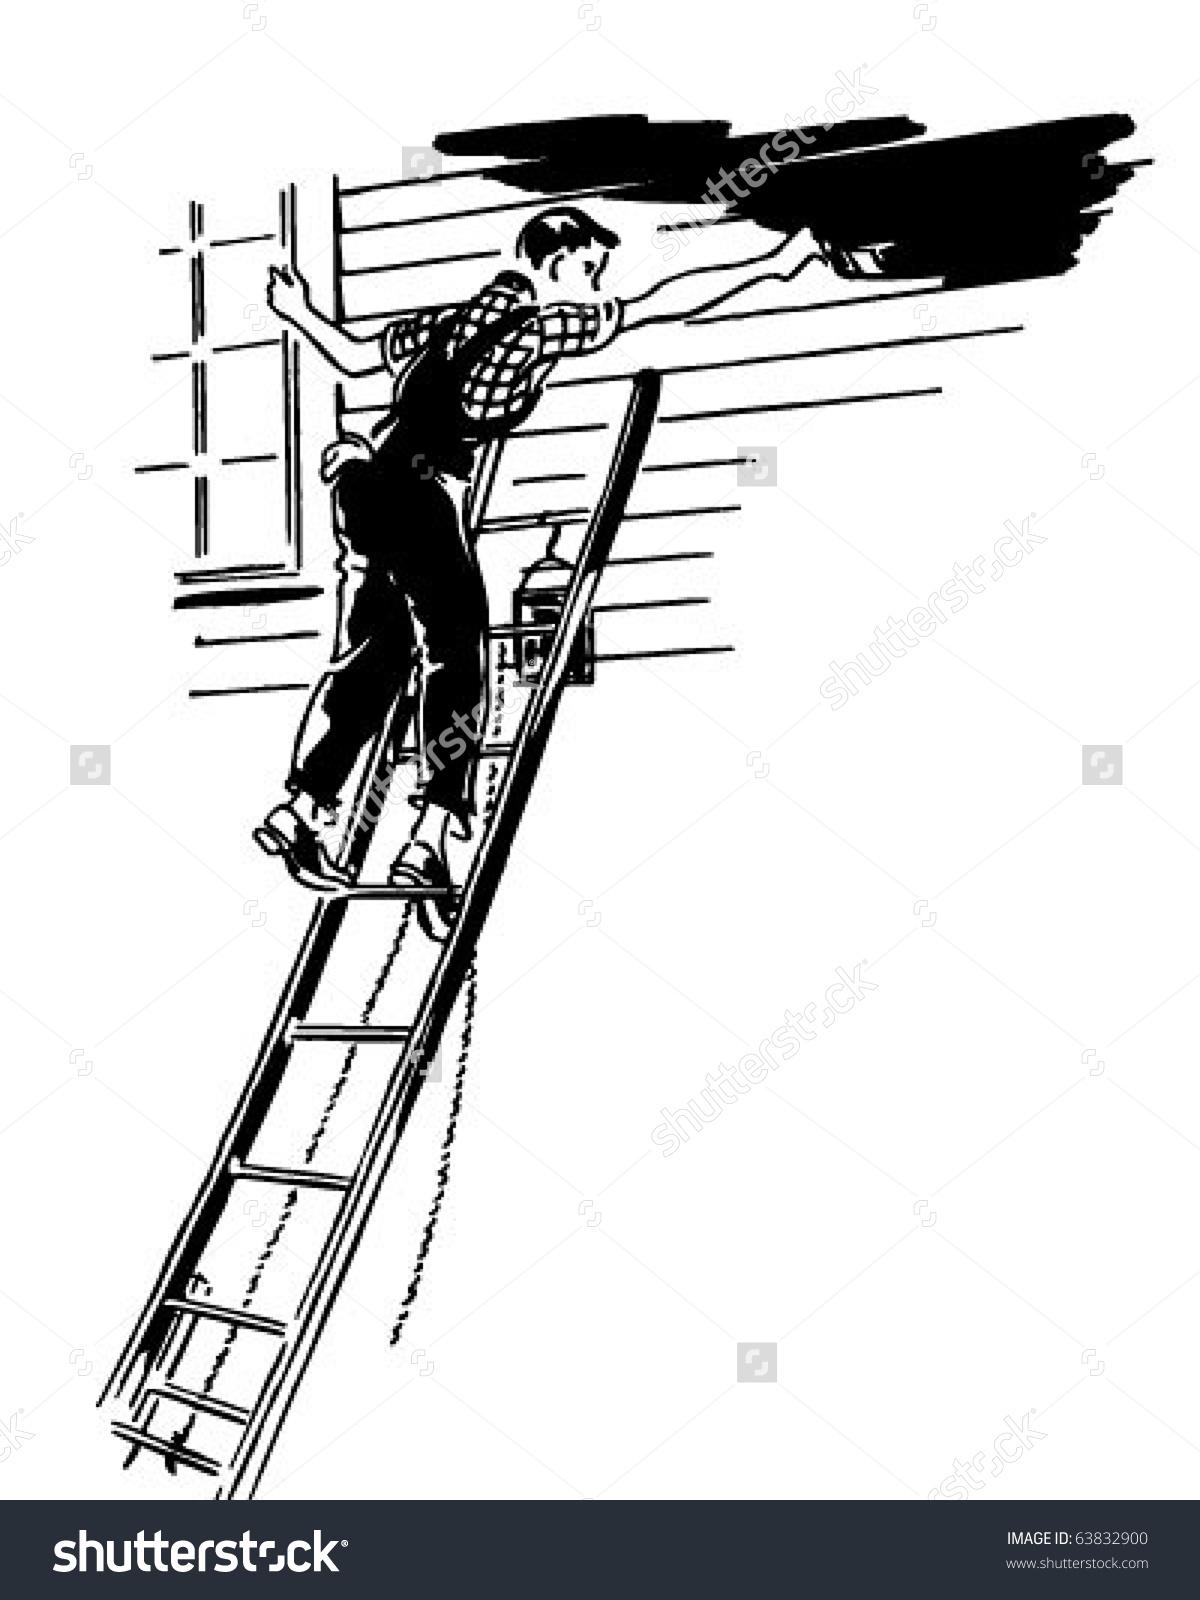 Man Painting Retro Clipart Illustration Stock Vector 63832900.